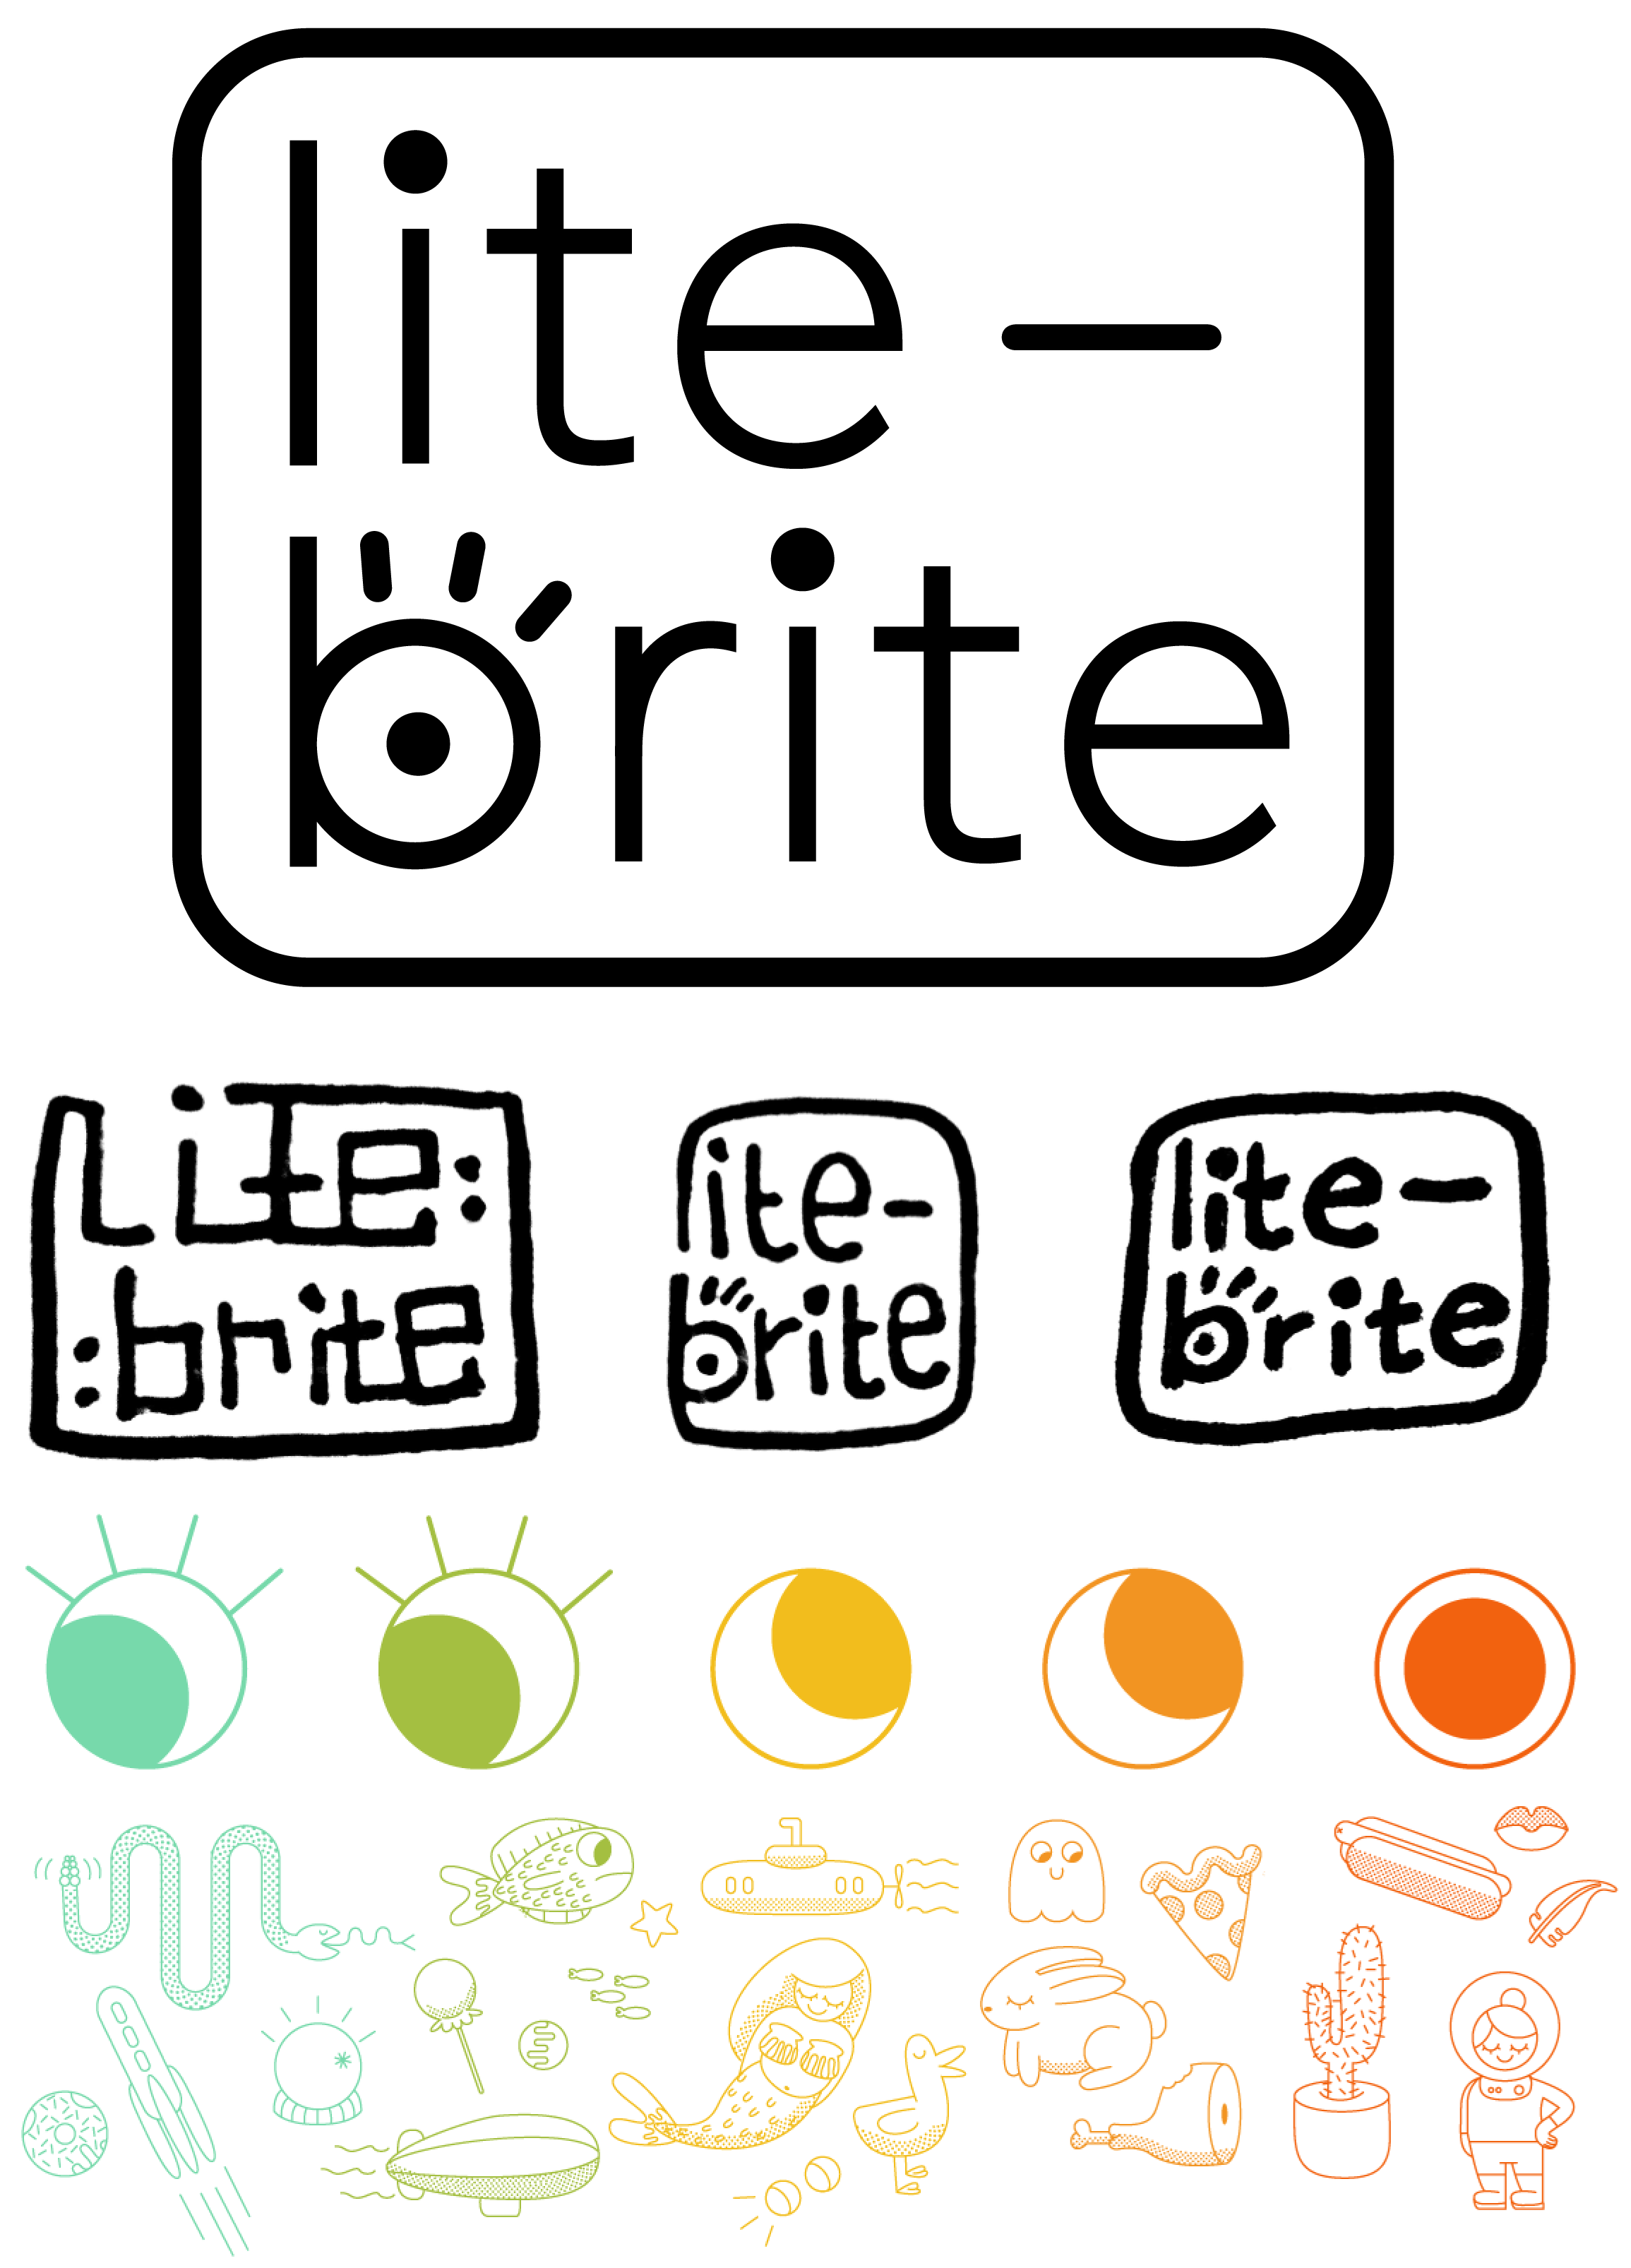 lite-brite1.png